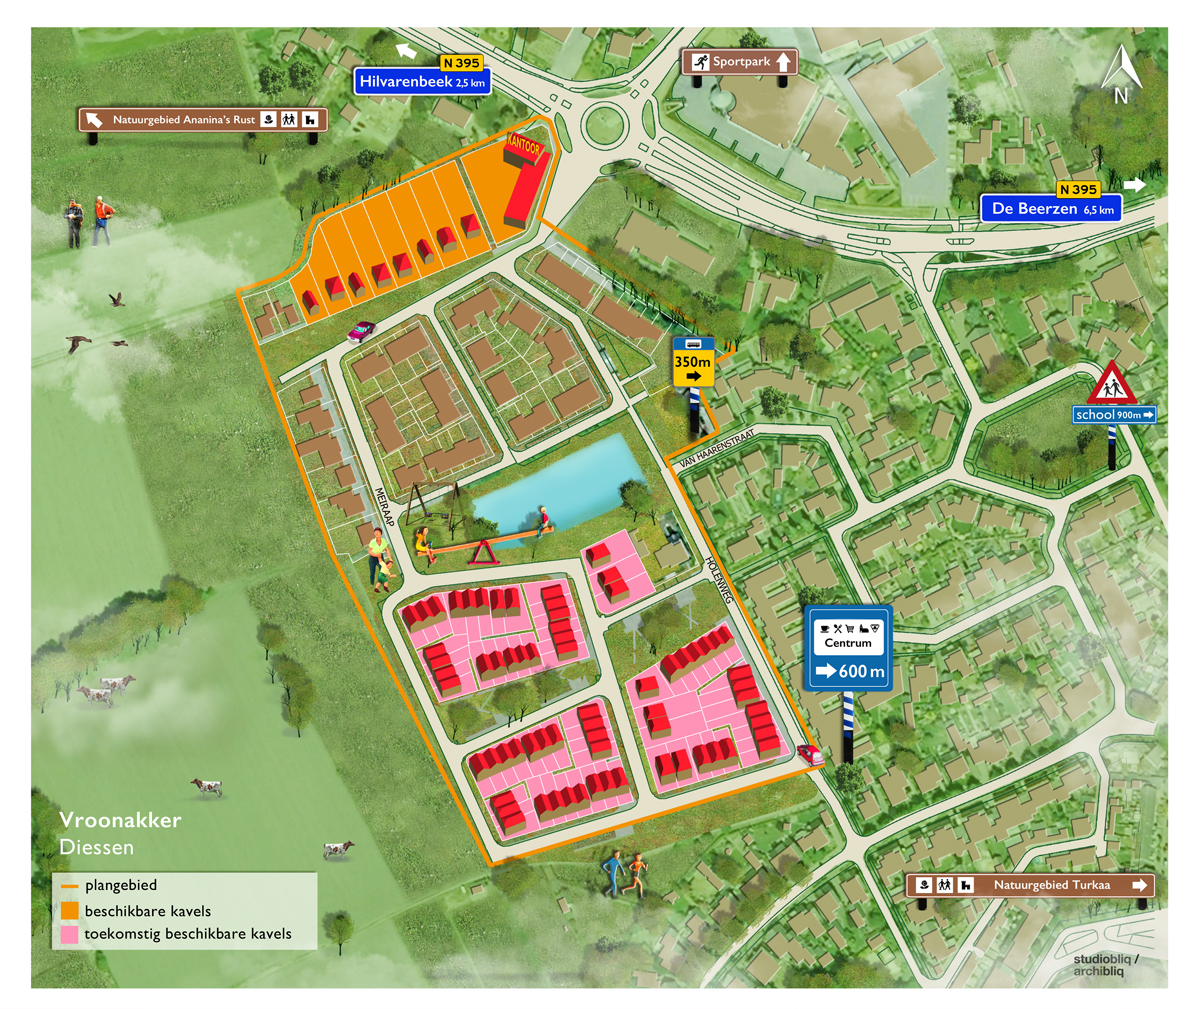 studio_bliq_plattegrond_gemeente_hilvarenbeek_plan_illustratie_kavel_4